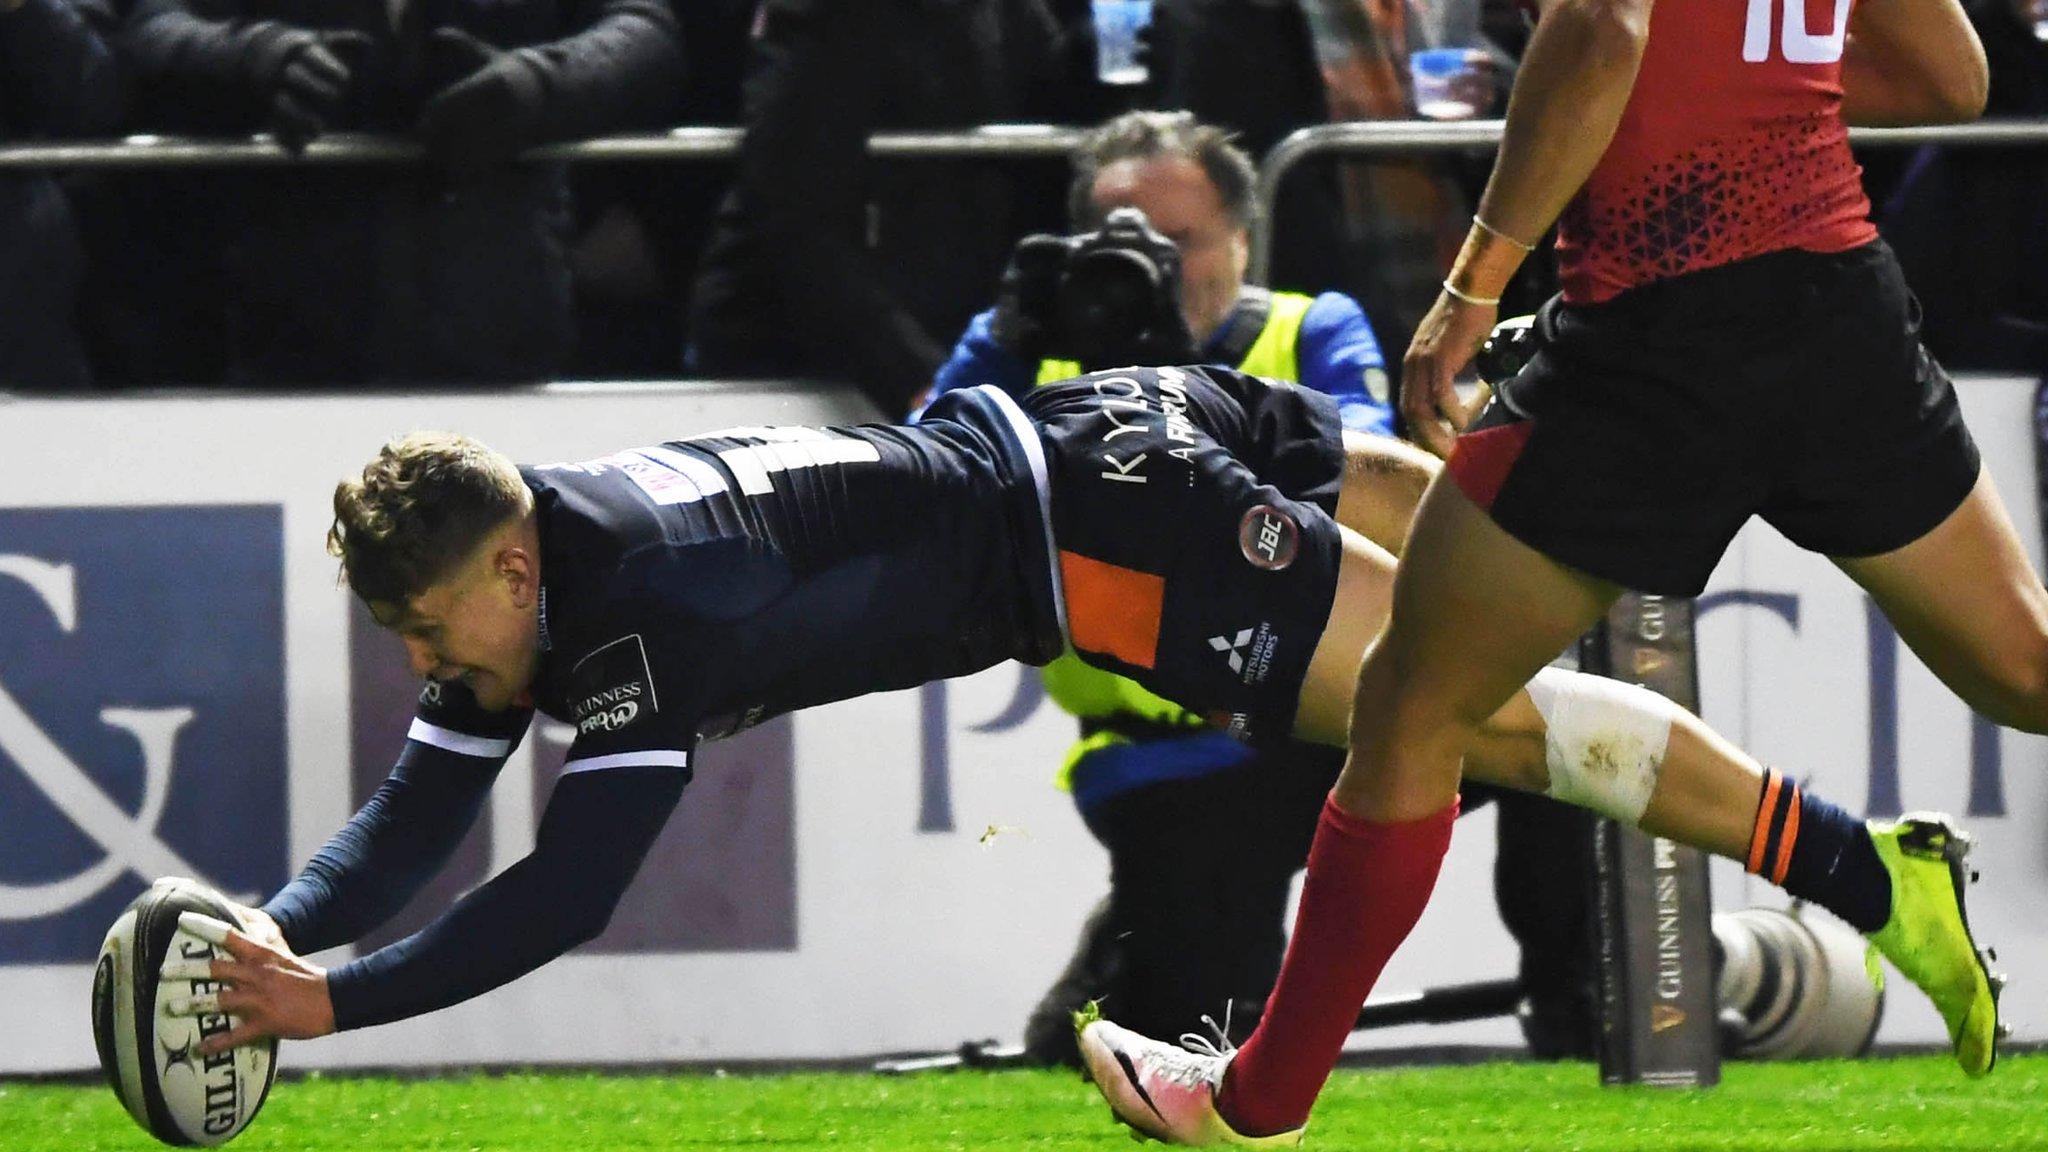 Pro14: Edinburgh 38-0 Southern Kings - Hosts score six tries to move second